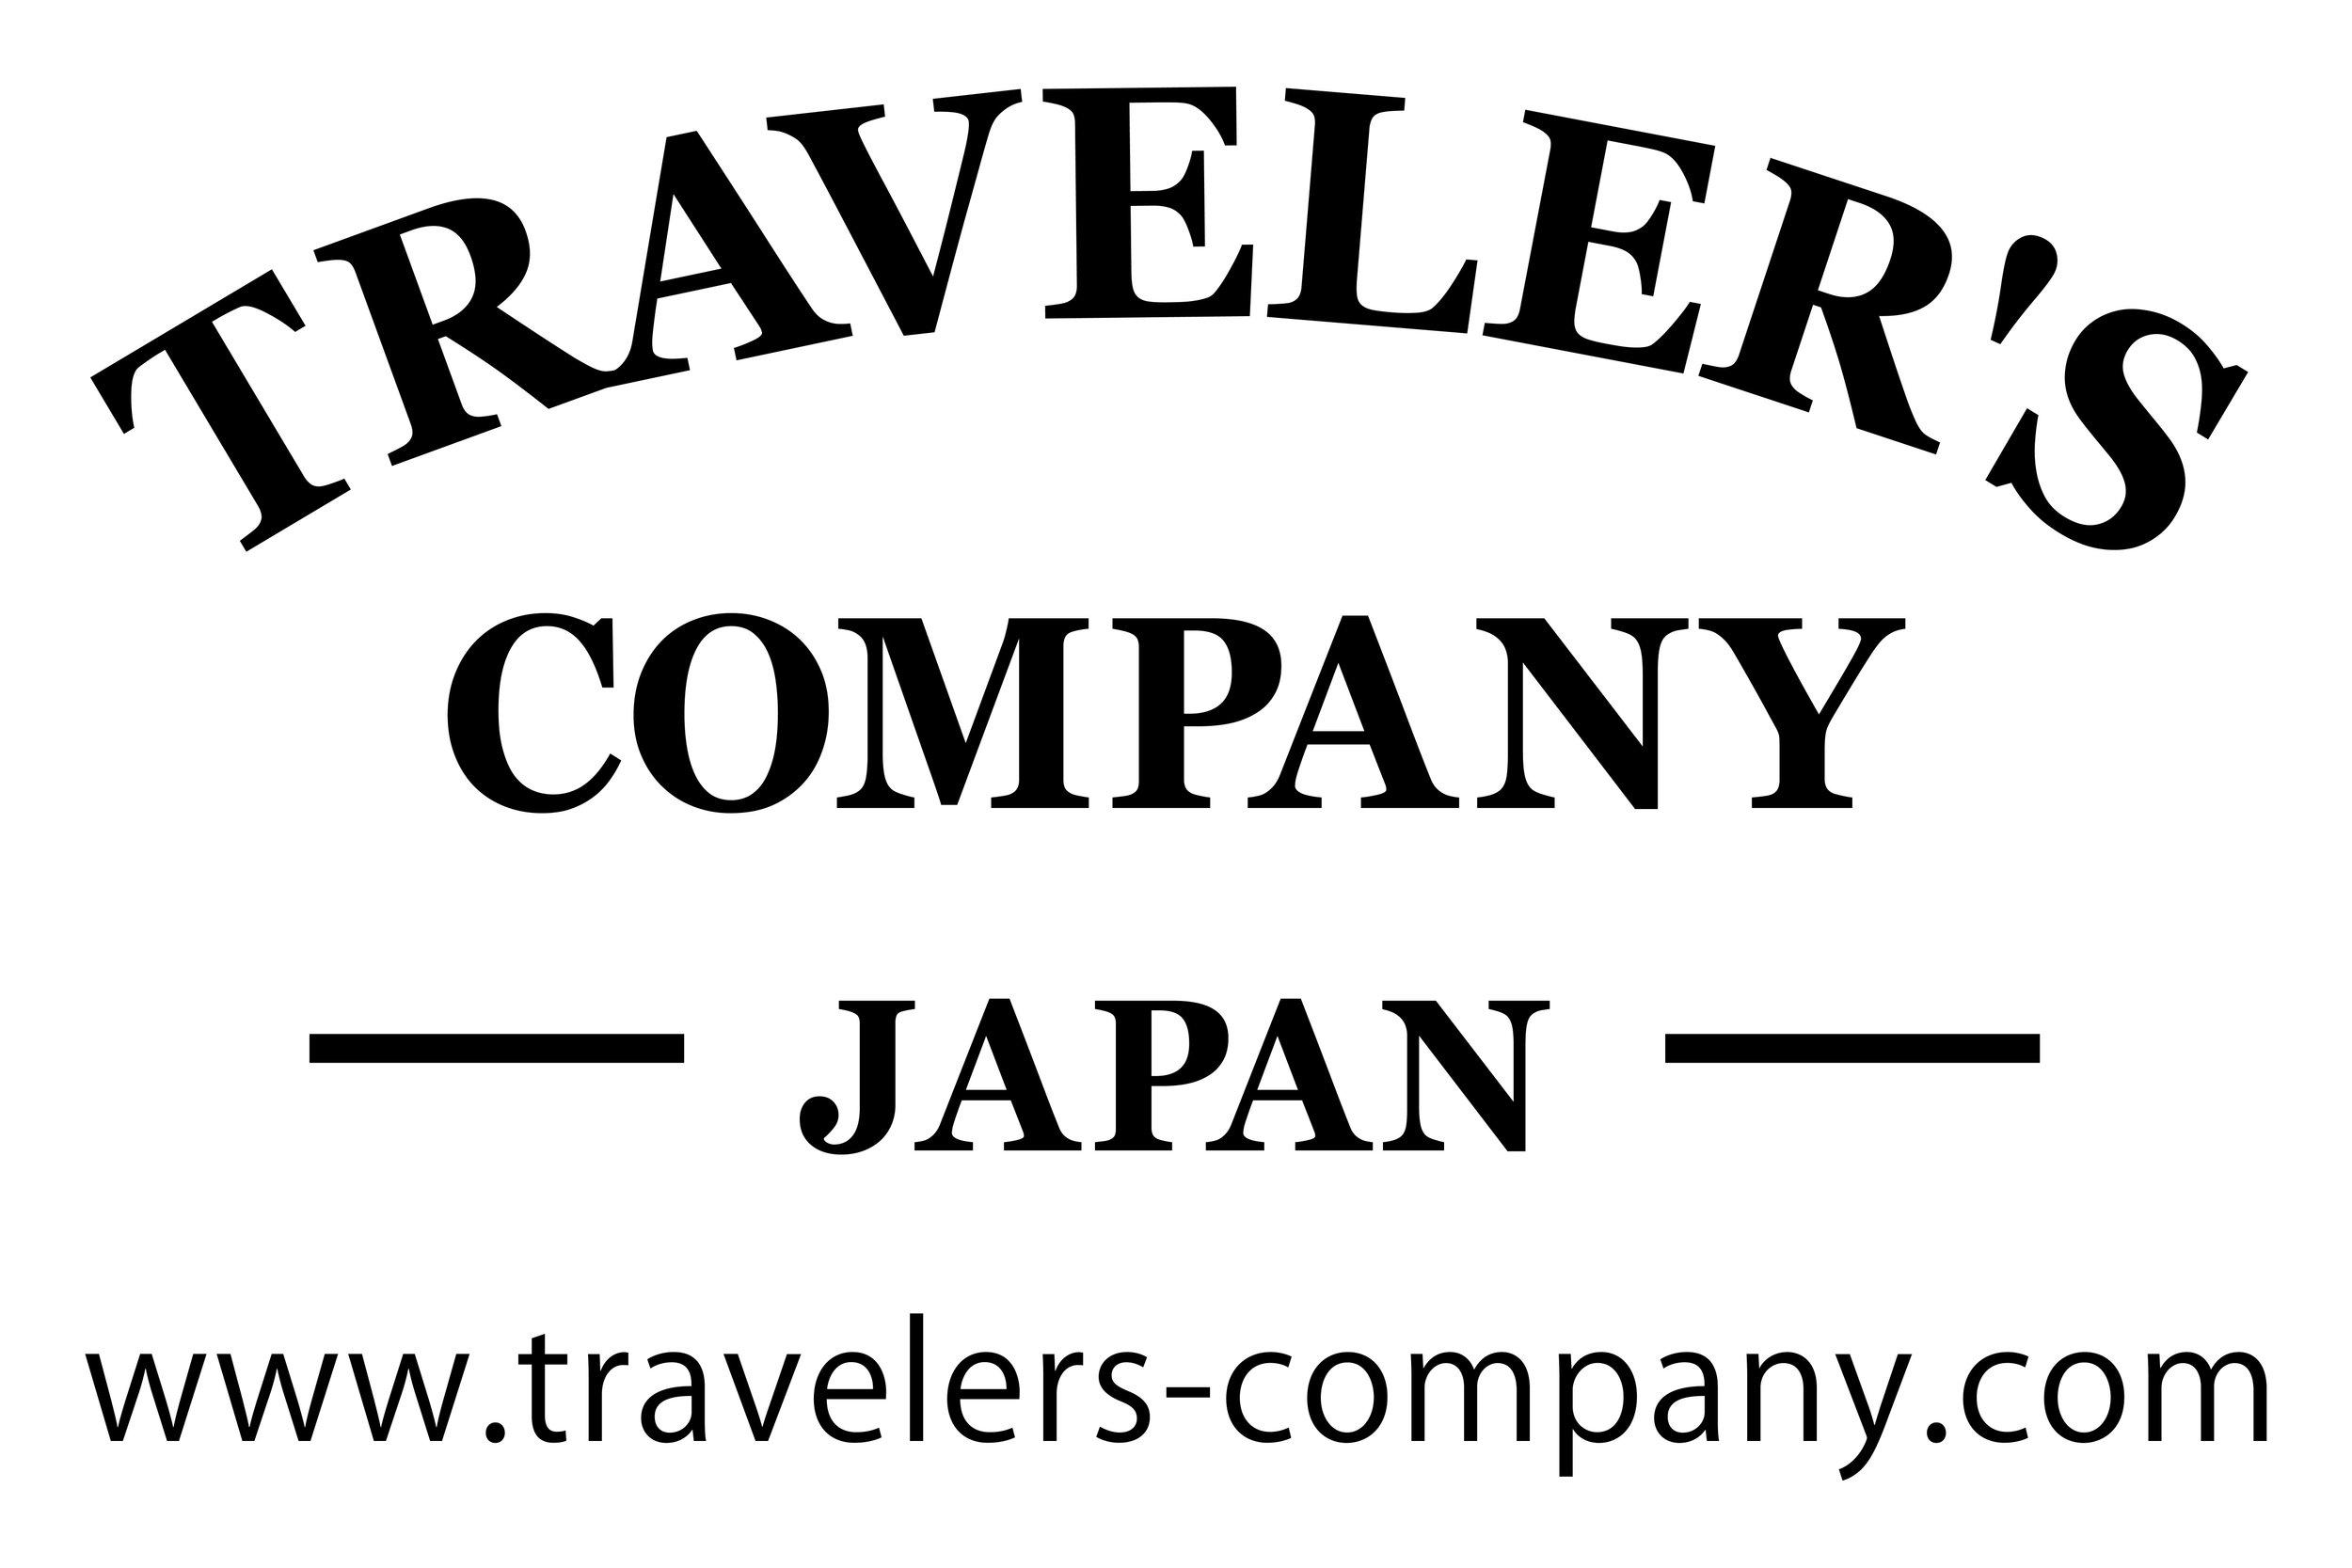 TRAVELER'S COMPANY Logo 1.jpg